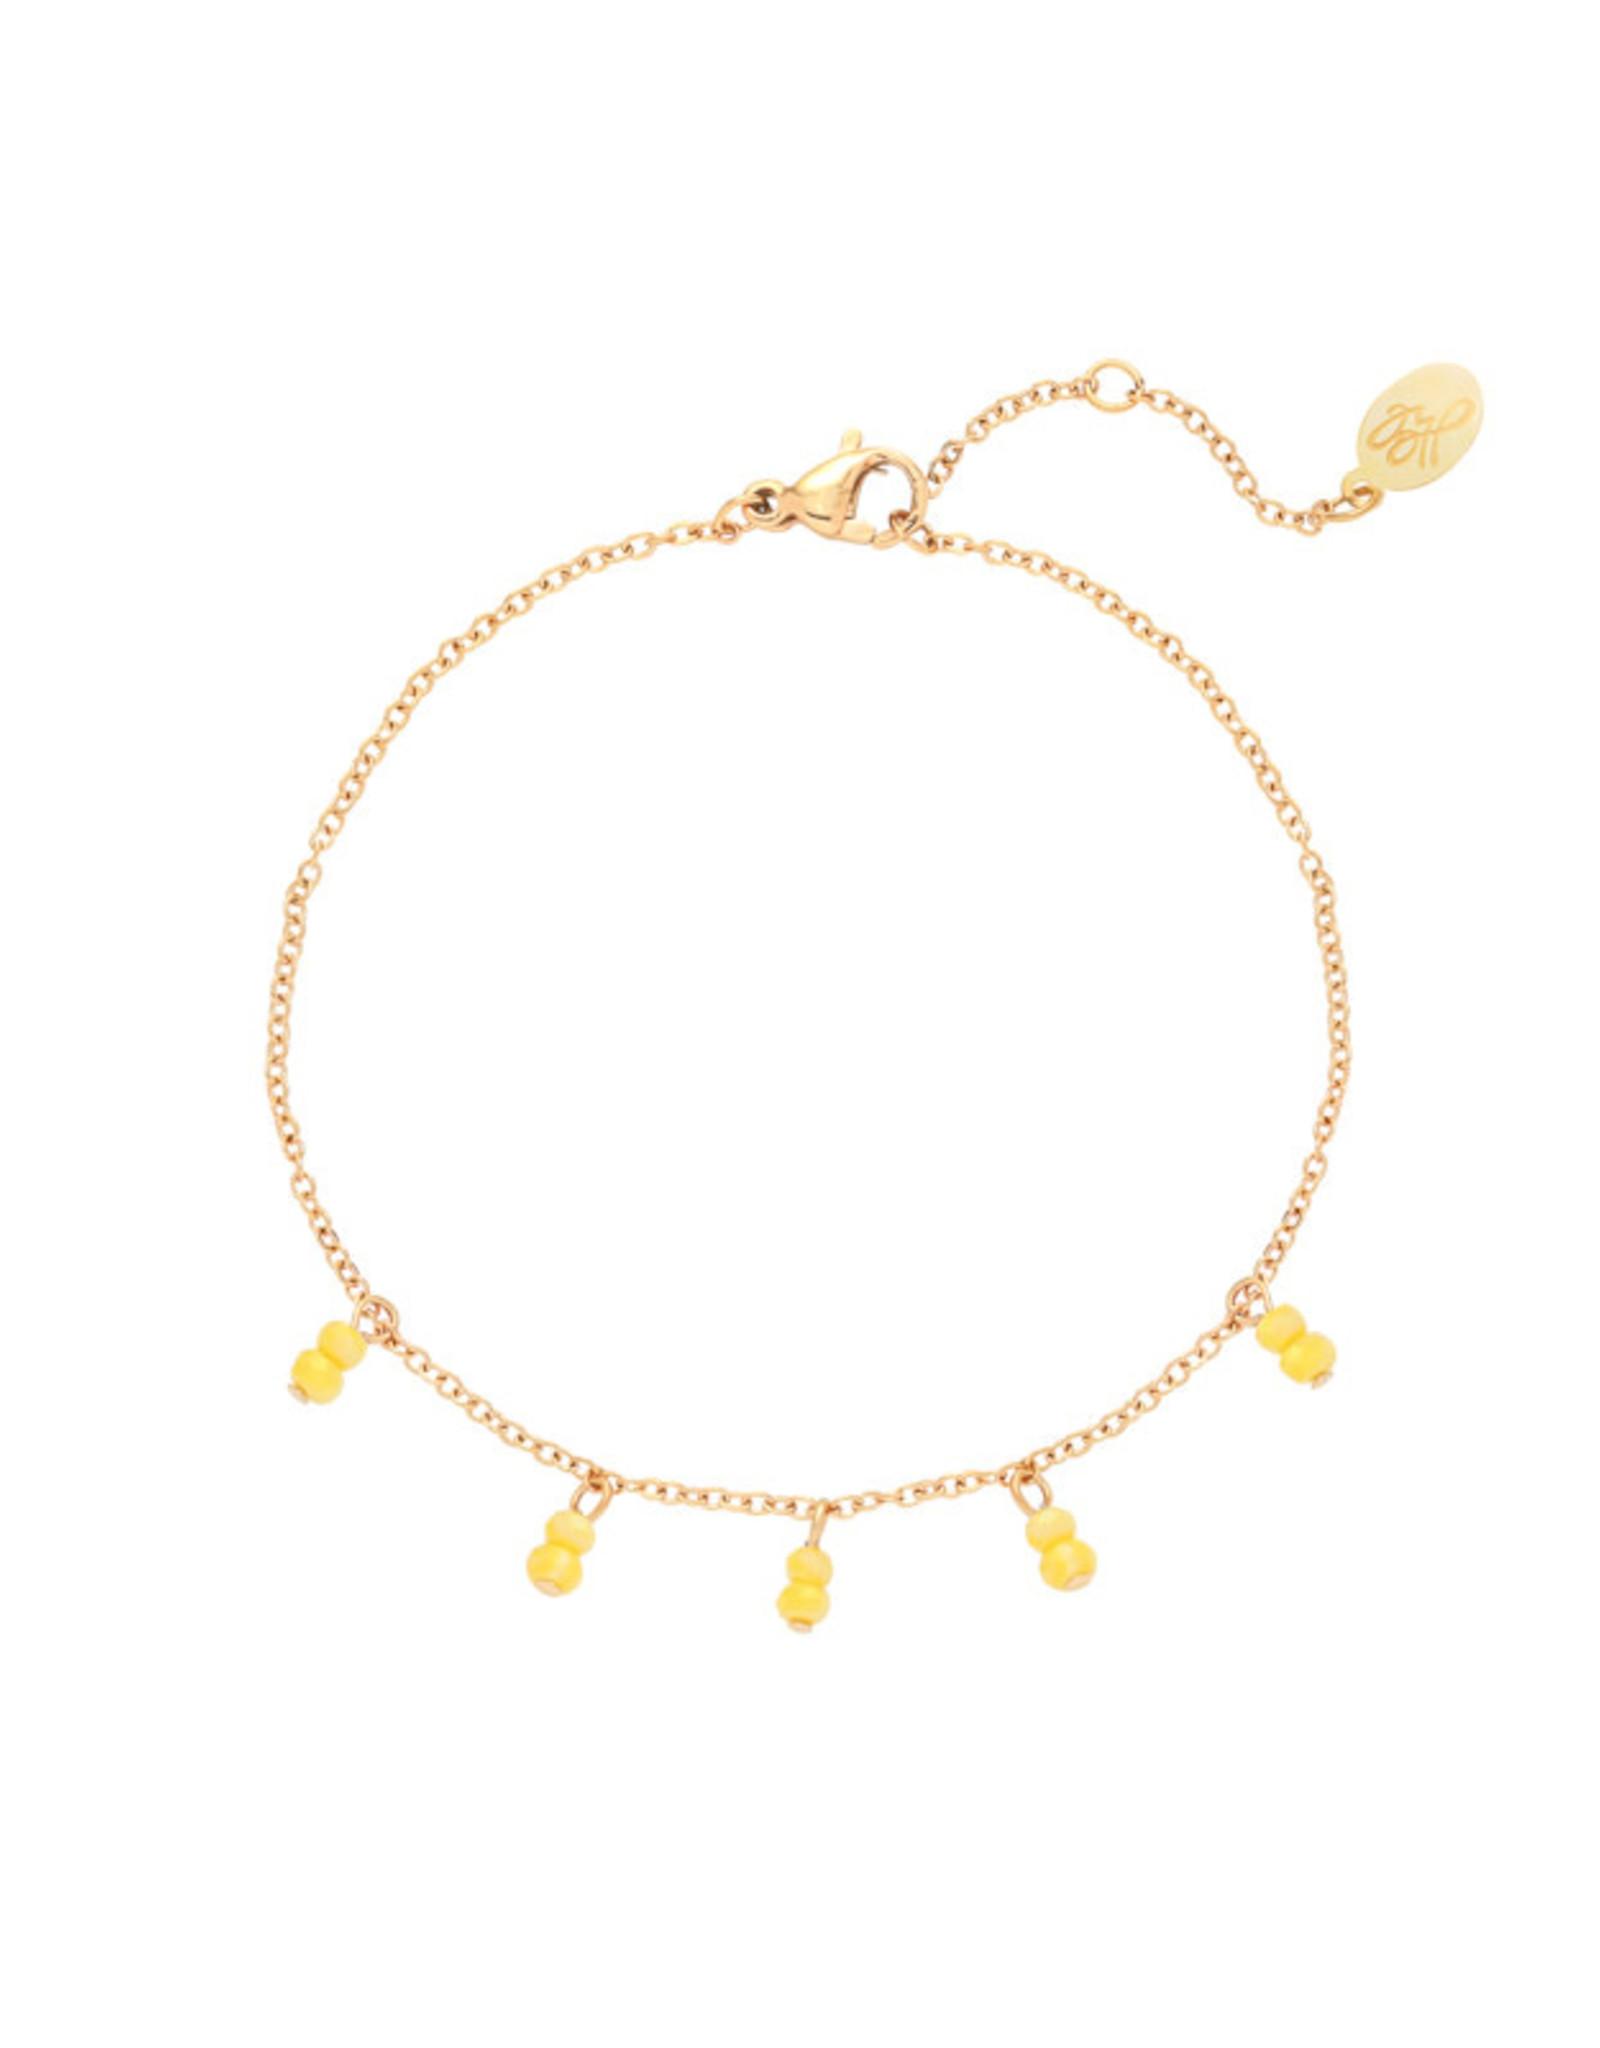 Bracelet yellow swirl gold